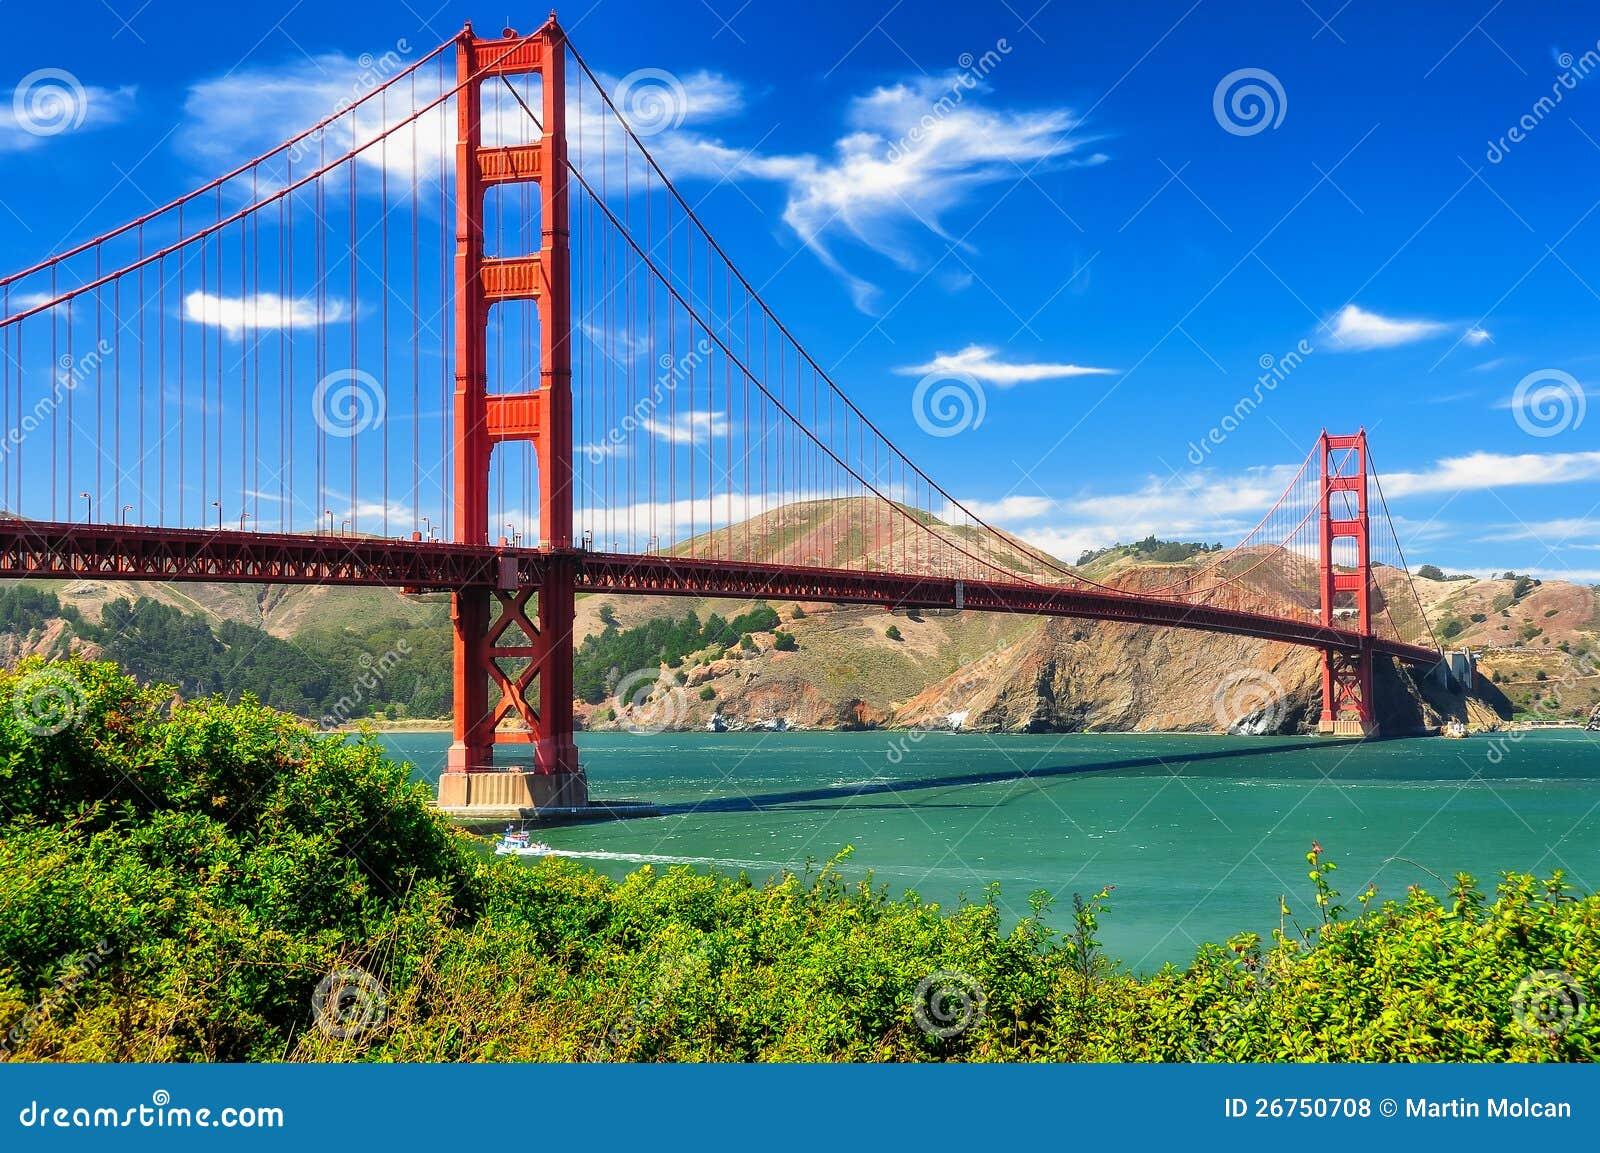 Royalty Free Stock Photos  Golden gate bridge vivid day landscapeGolden Gate Bridge At Day